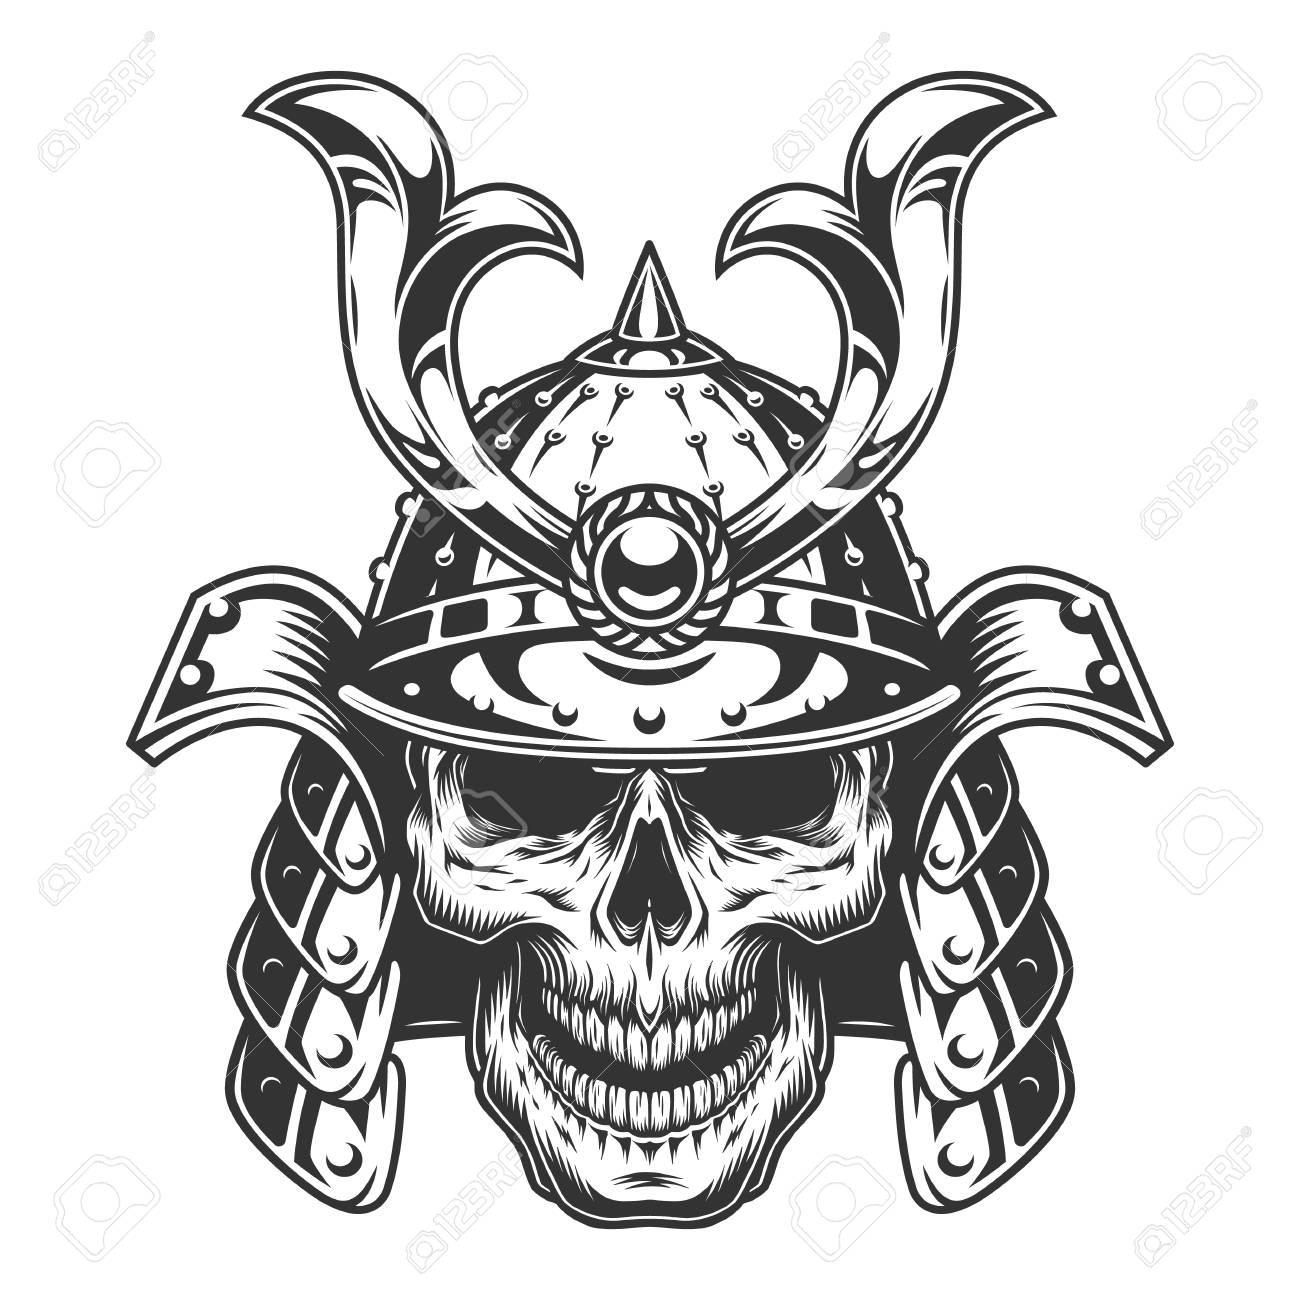 Skull In Samurai Helmet Royalty Free Cliparts Vectors And Stock Illustration Image 108111608